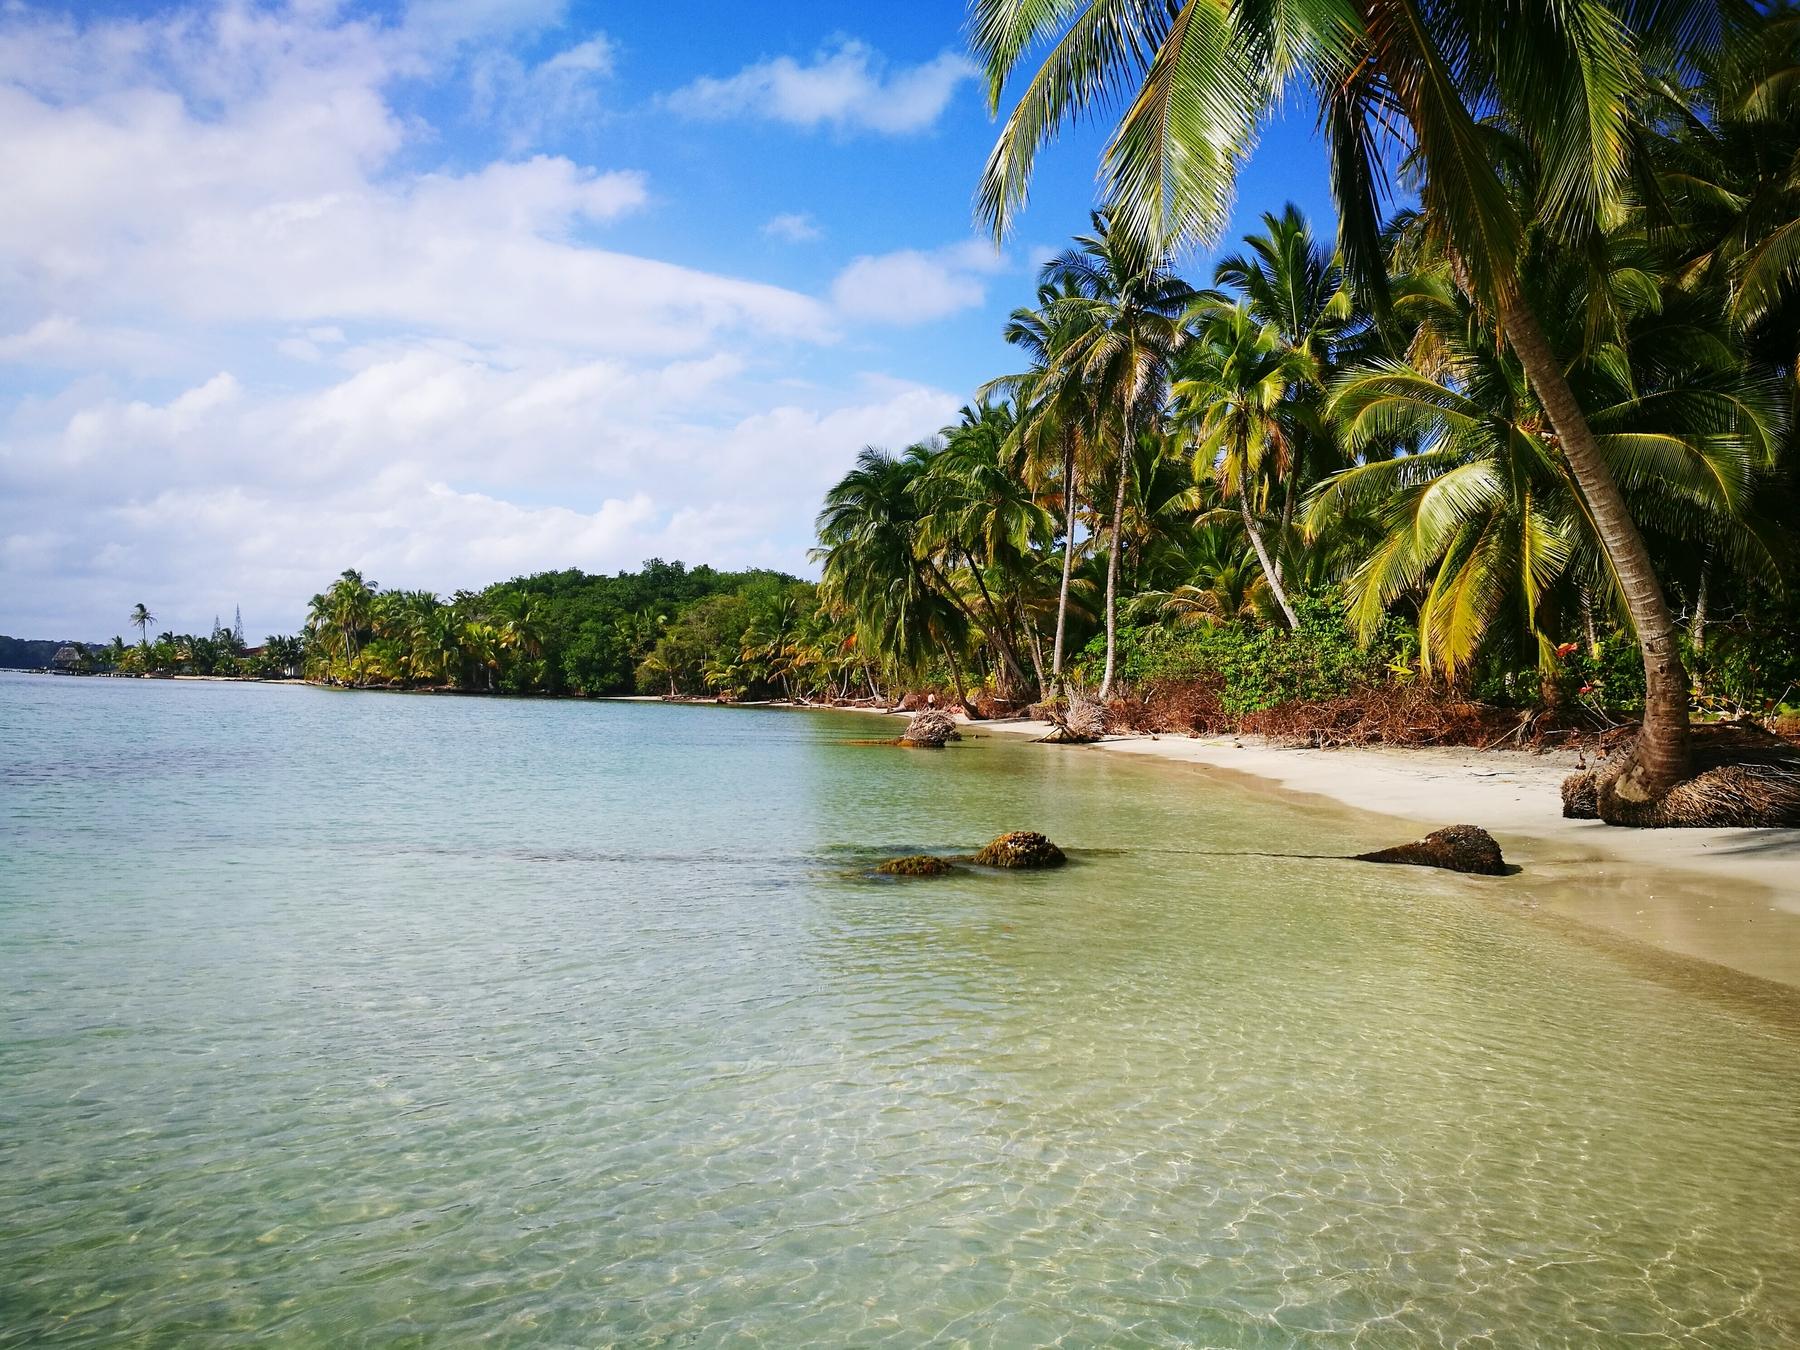 Bocas del Toro, Panama: An ideal long holiday destination